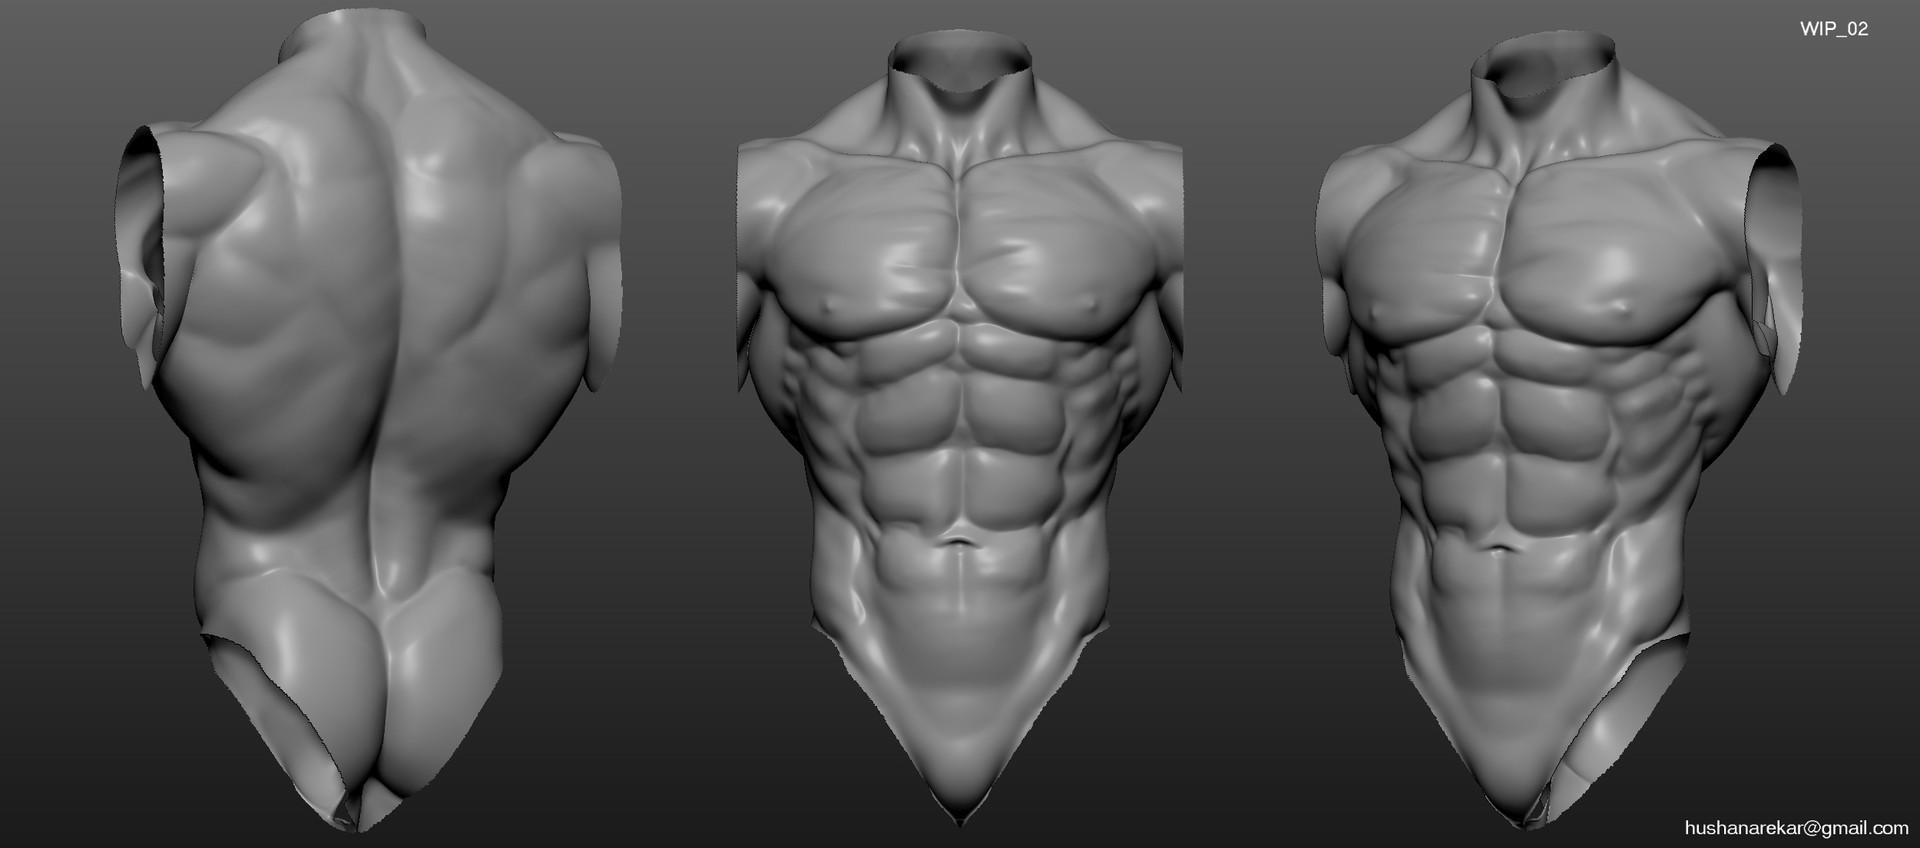 Bhushan arekar torso 02